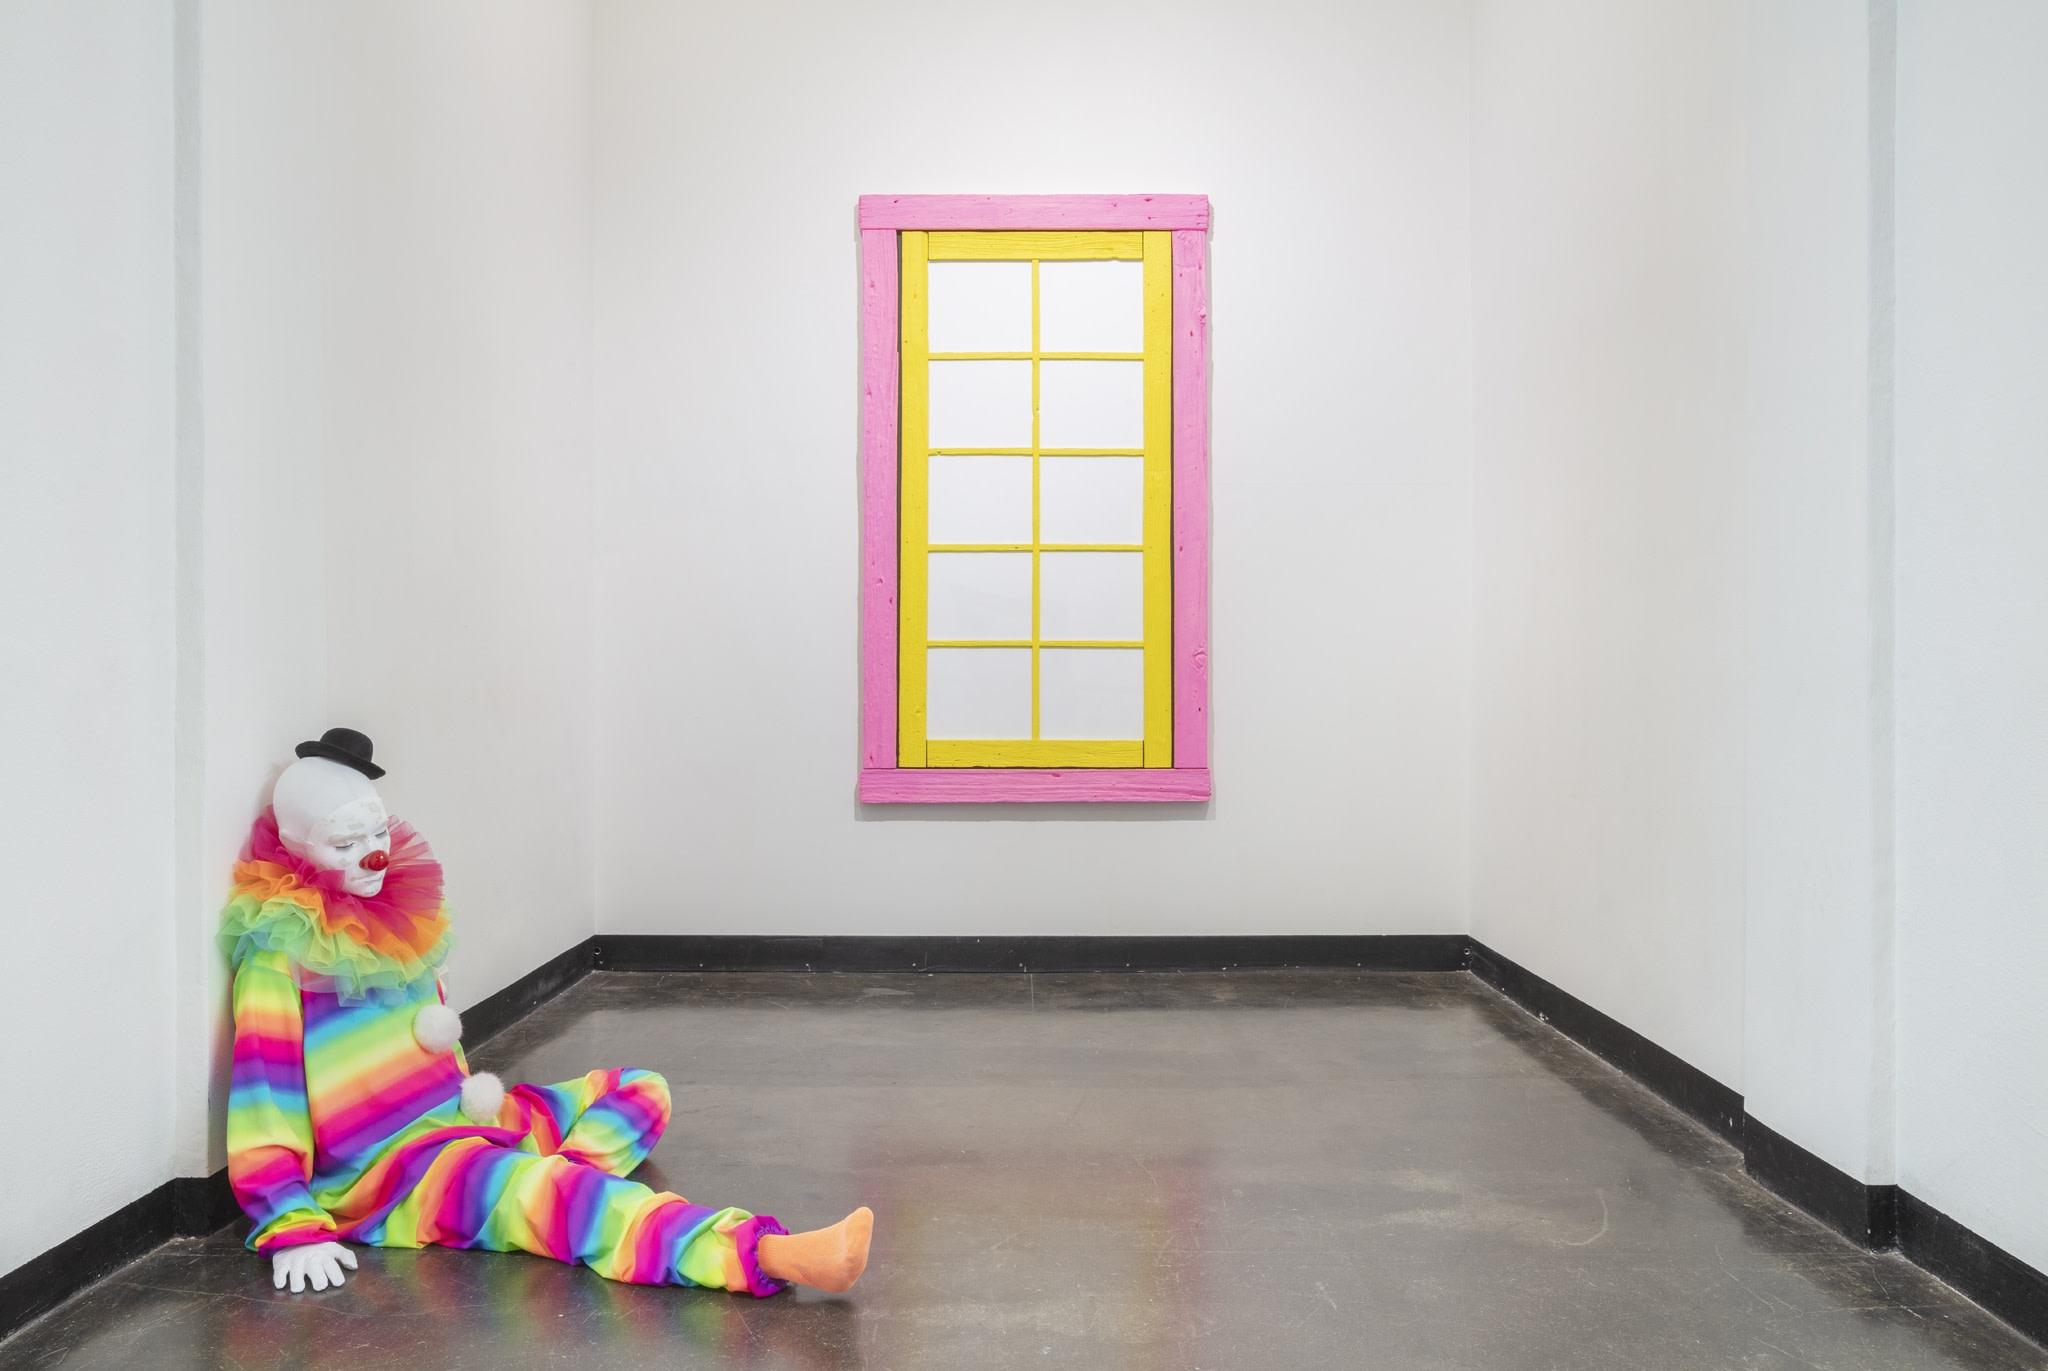 Exhibition view: Ugo Rondinone, everyone gets lighter, 2019, Kunsthalle Helsinki, 2019. Photo © Angel Gil